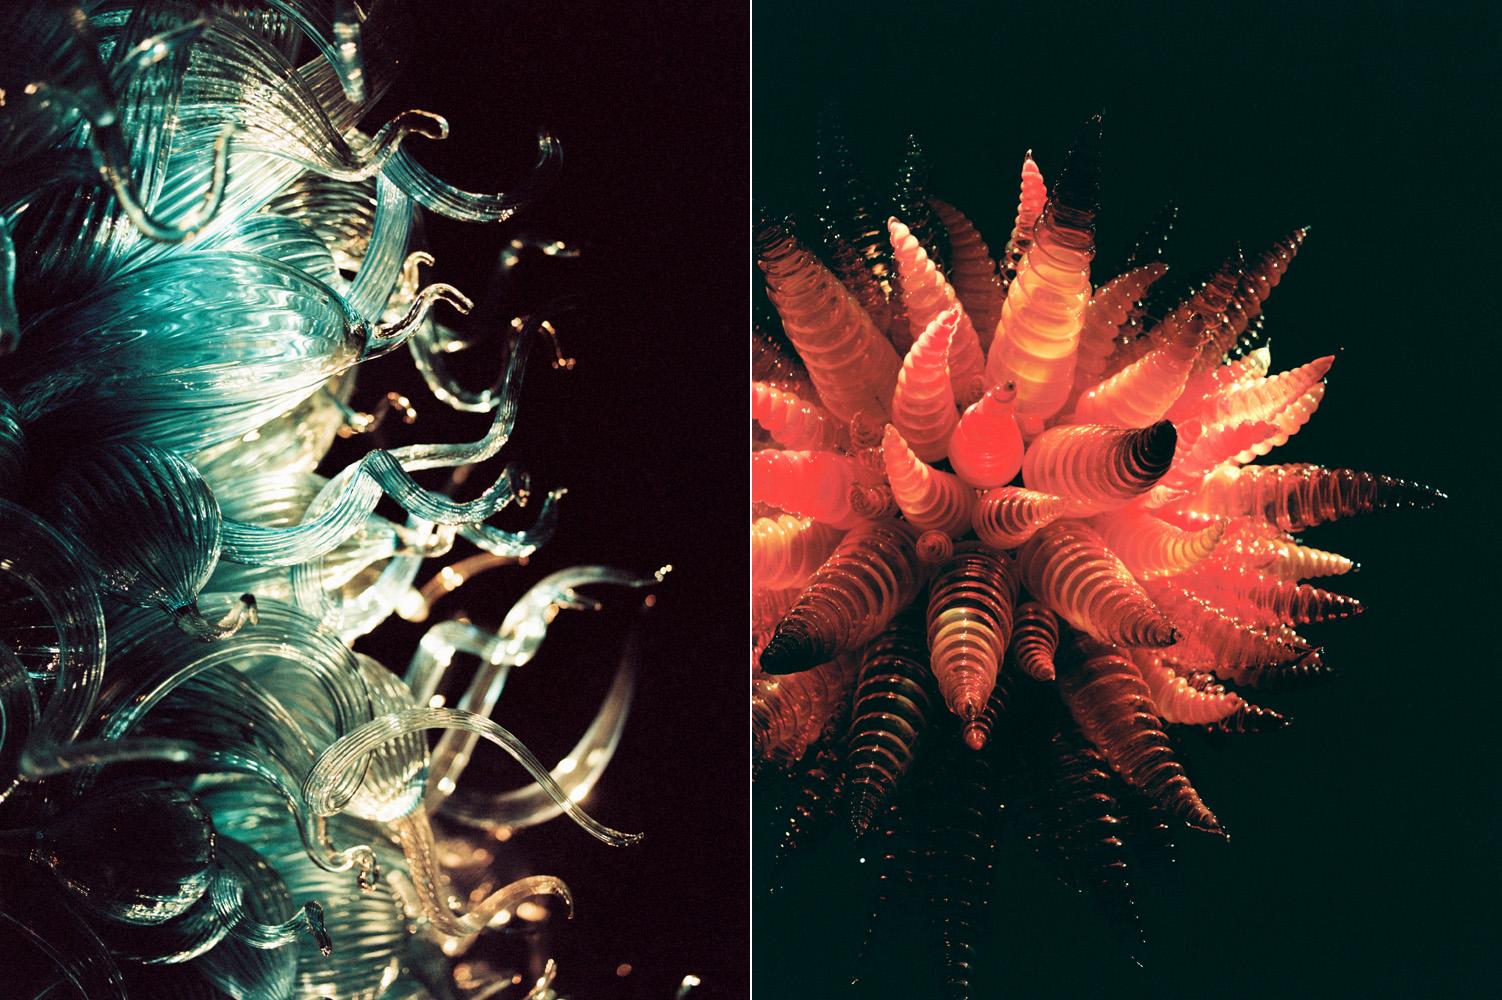 chihuly garden of glass 4.jpg